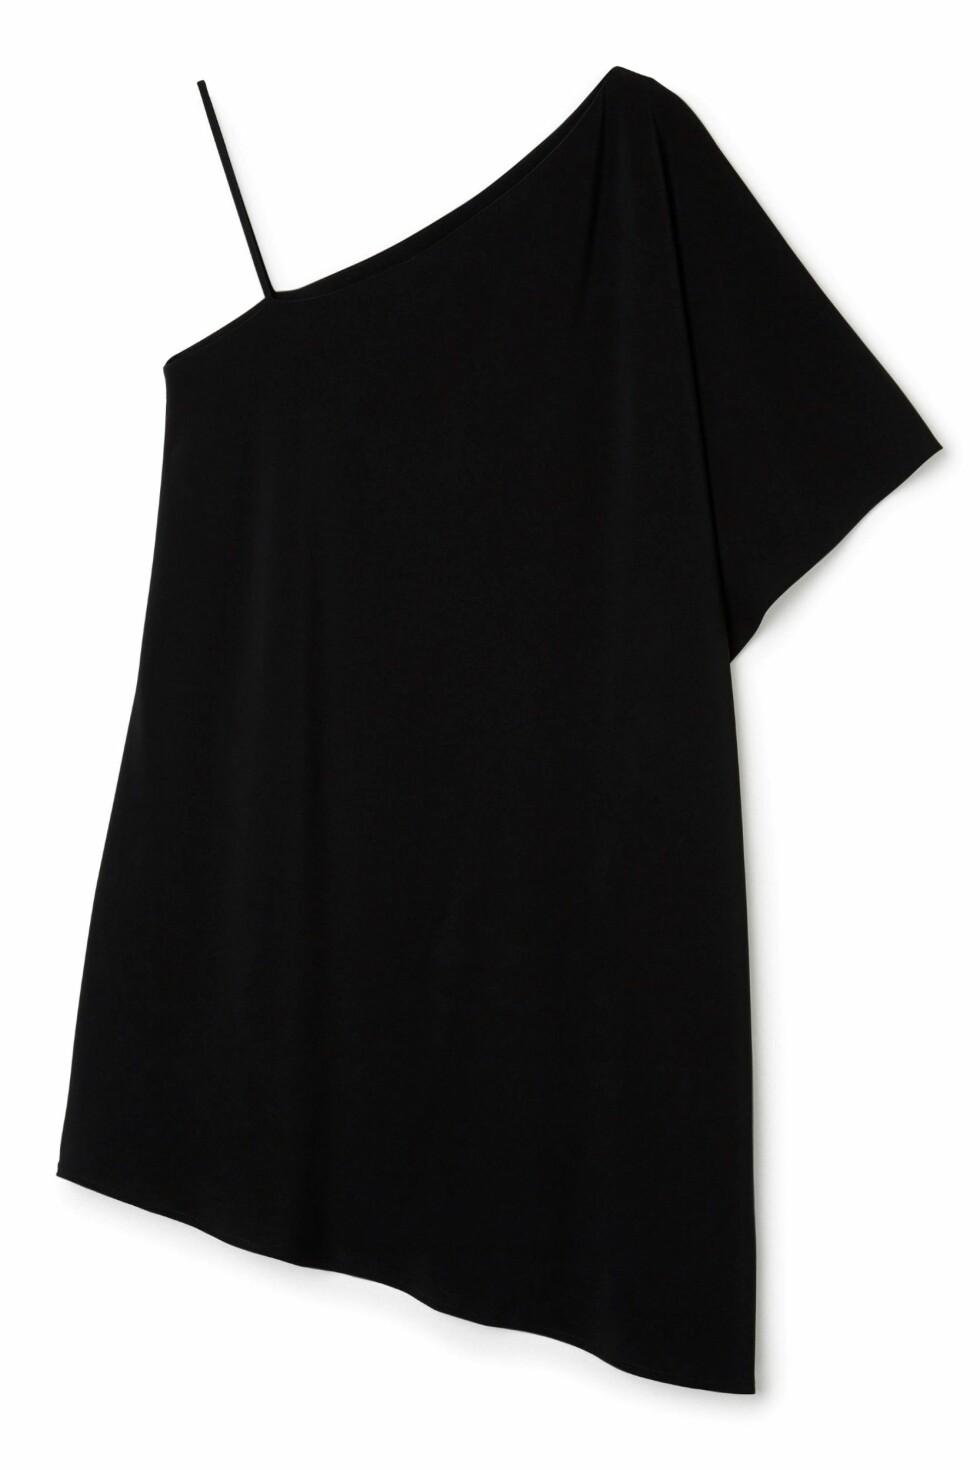 Kjole fra Weekday | kr 350 | http://shop.weekday.com/se/Womens_shop/Sale/All/Paloma_Dress/5453574-7407403.1?image=1328240#c-47958